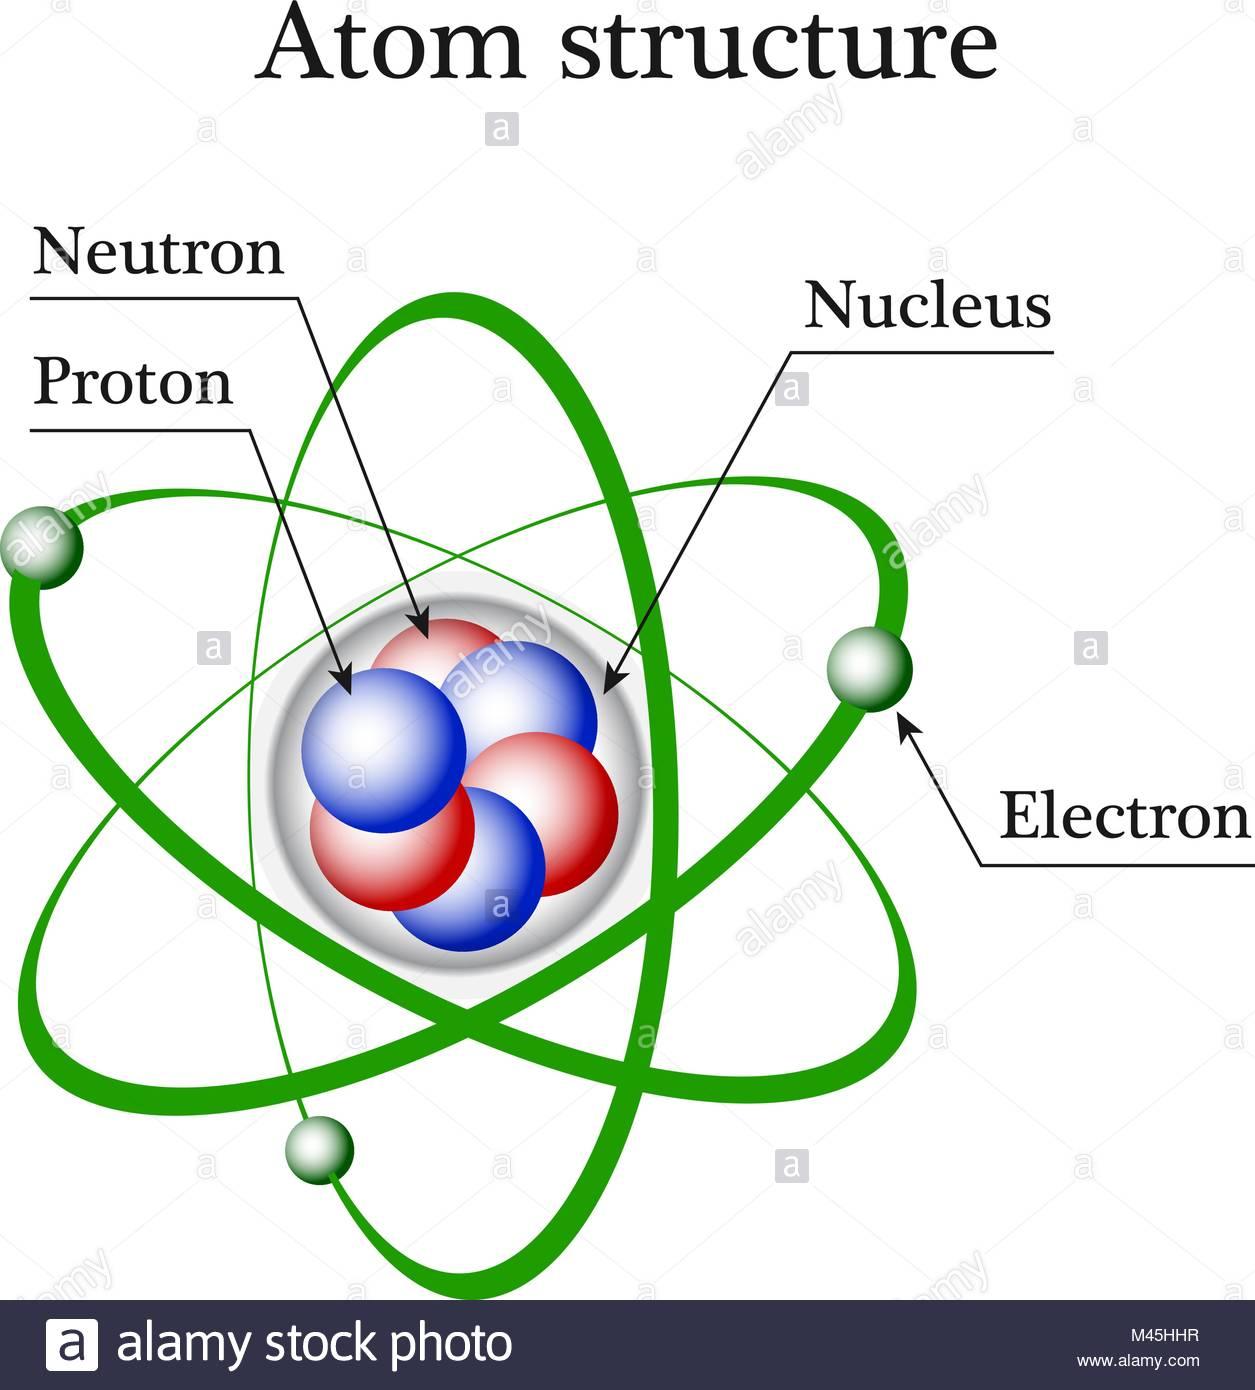 Atom structure stock vector art illustration vector image atom structure stock vector ccuart Images